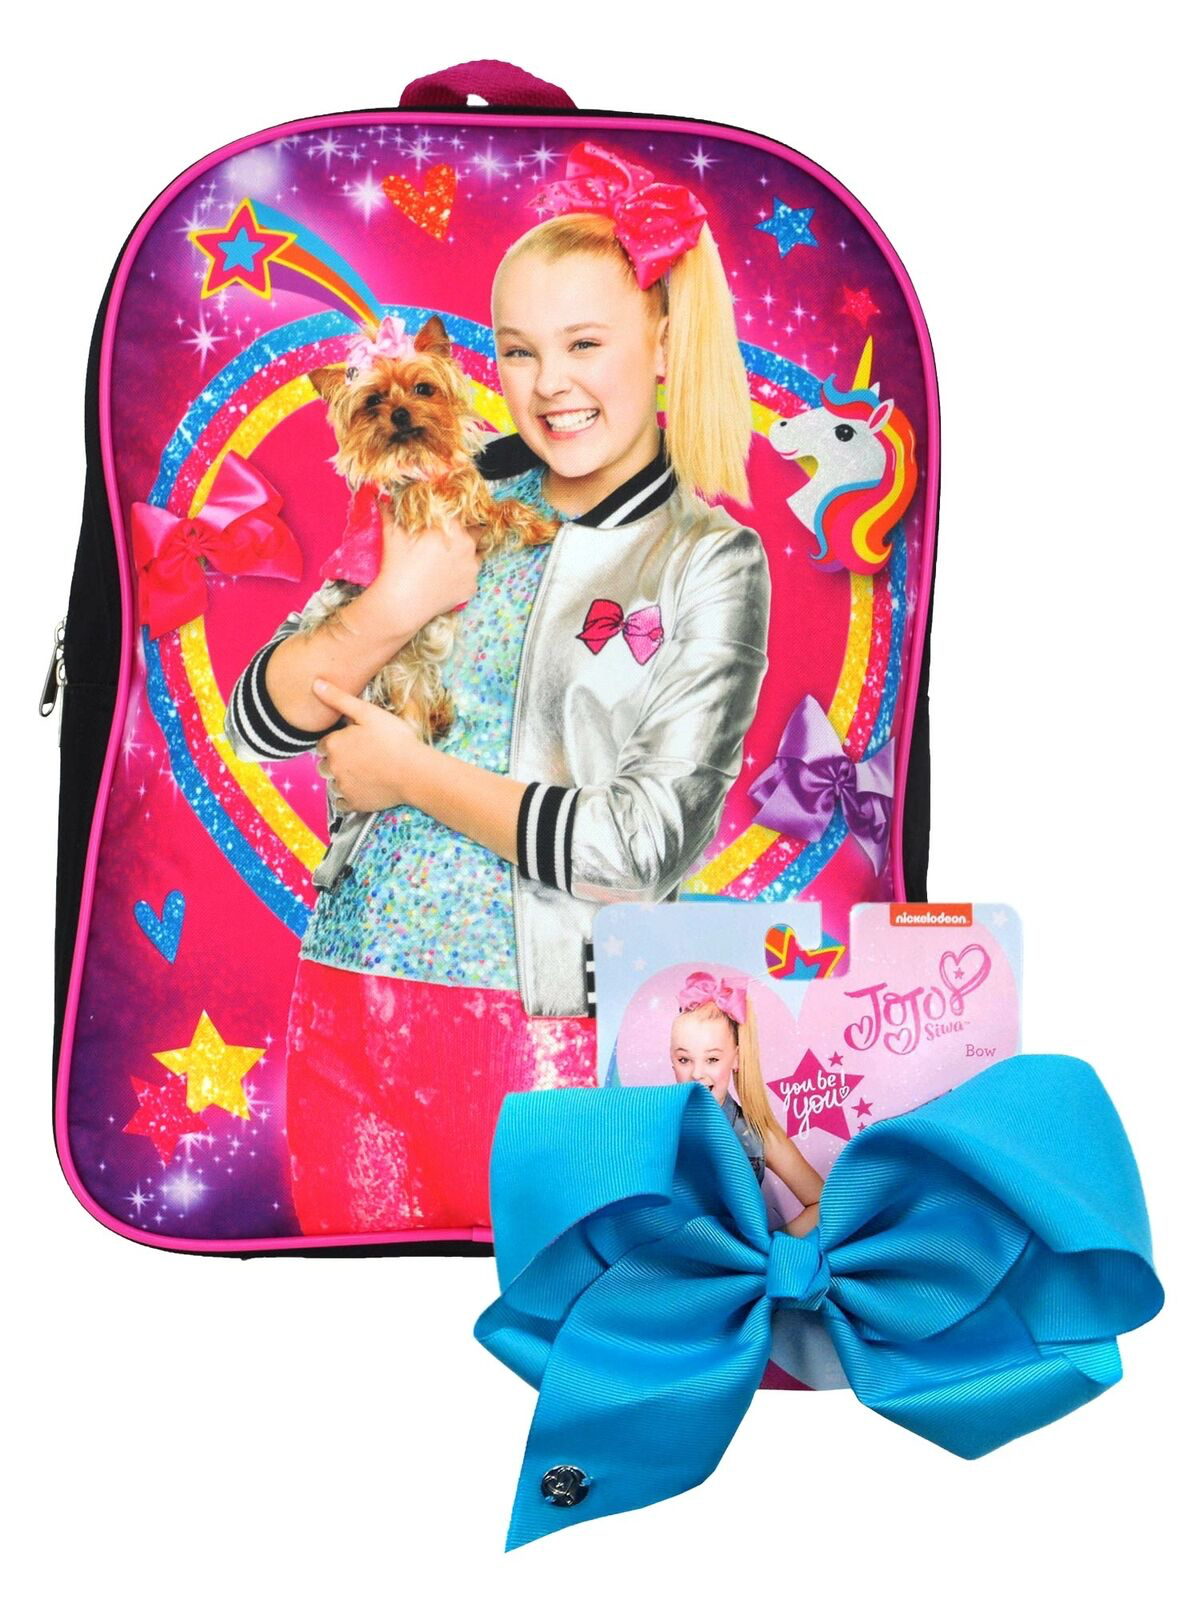 Price 17 99 Jojo Siwa Girls 15 Backpack Rainbow Stars Unicorn Large Blue Bow 2 Piece Set Jojo Siwa Blue Bow Jojo Siwa Outfits